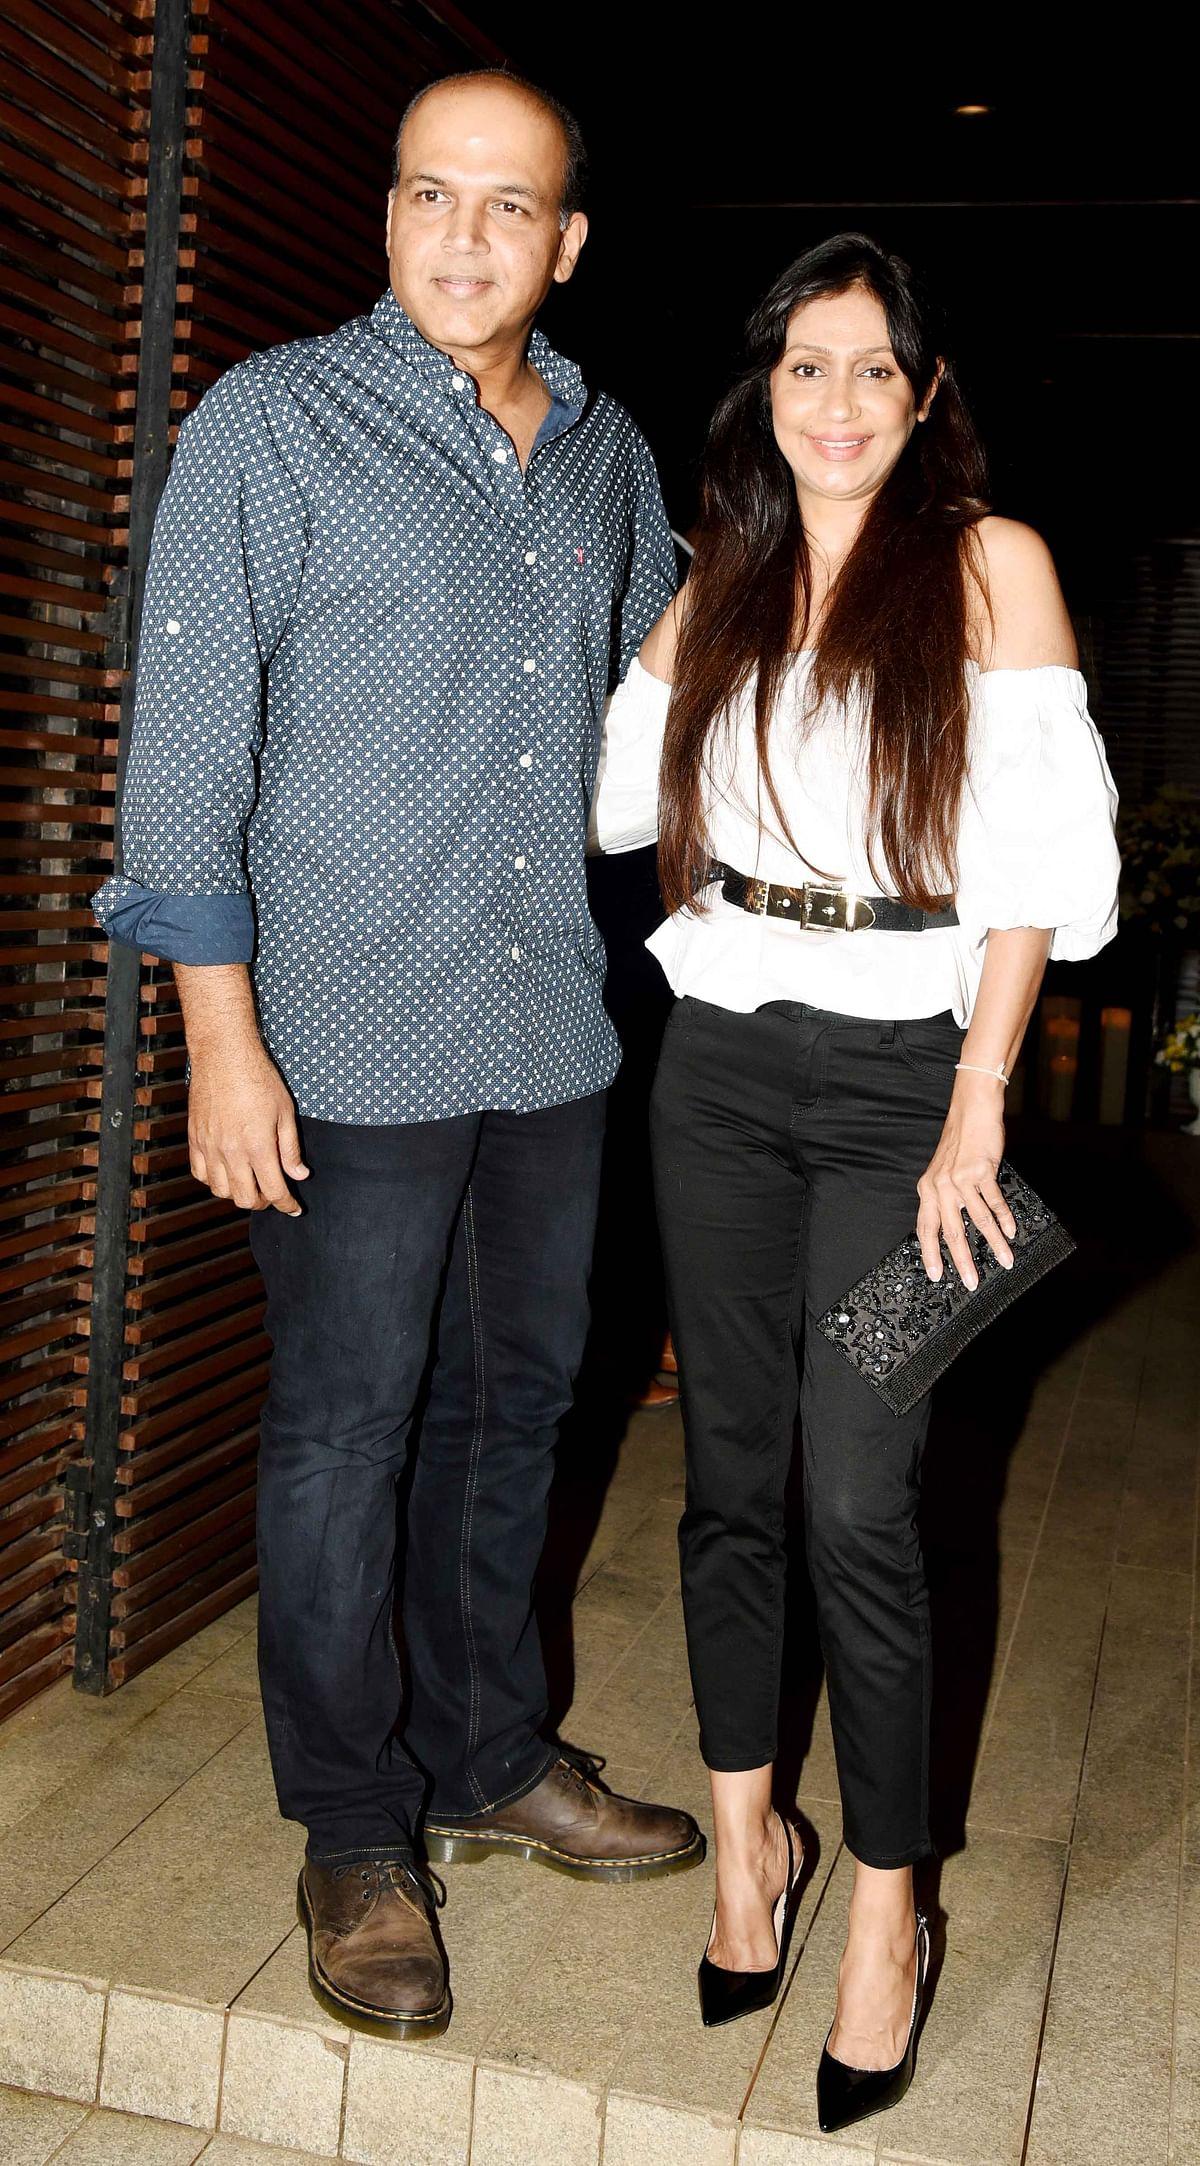 Ashutosh and Sunita Gowariker complement each other. (Photo: Yogen Shah)